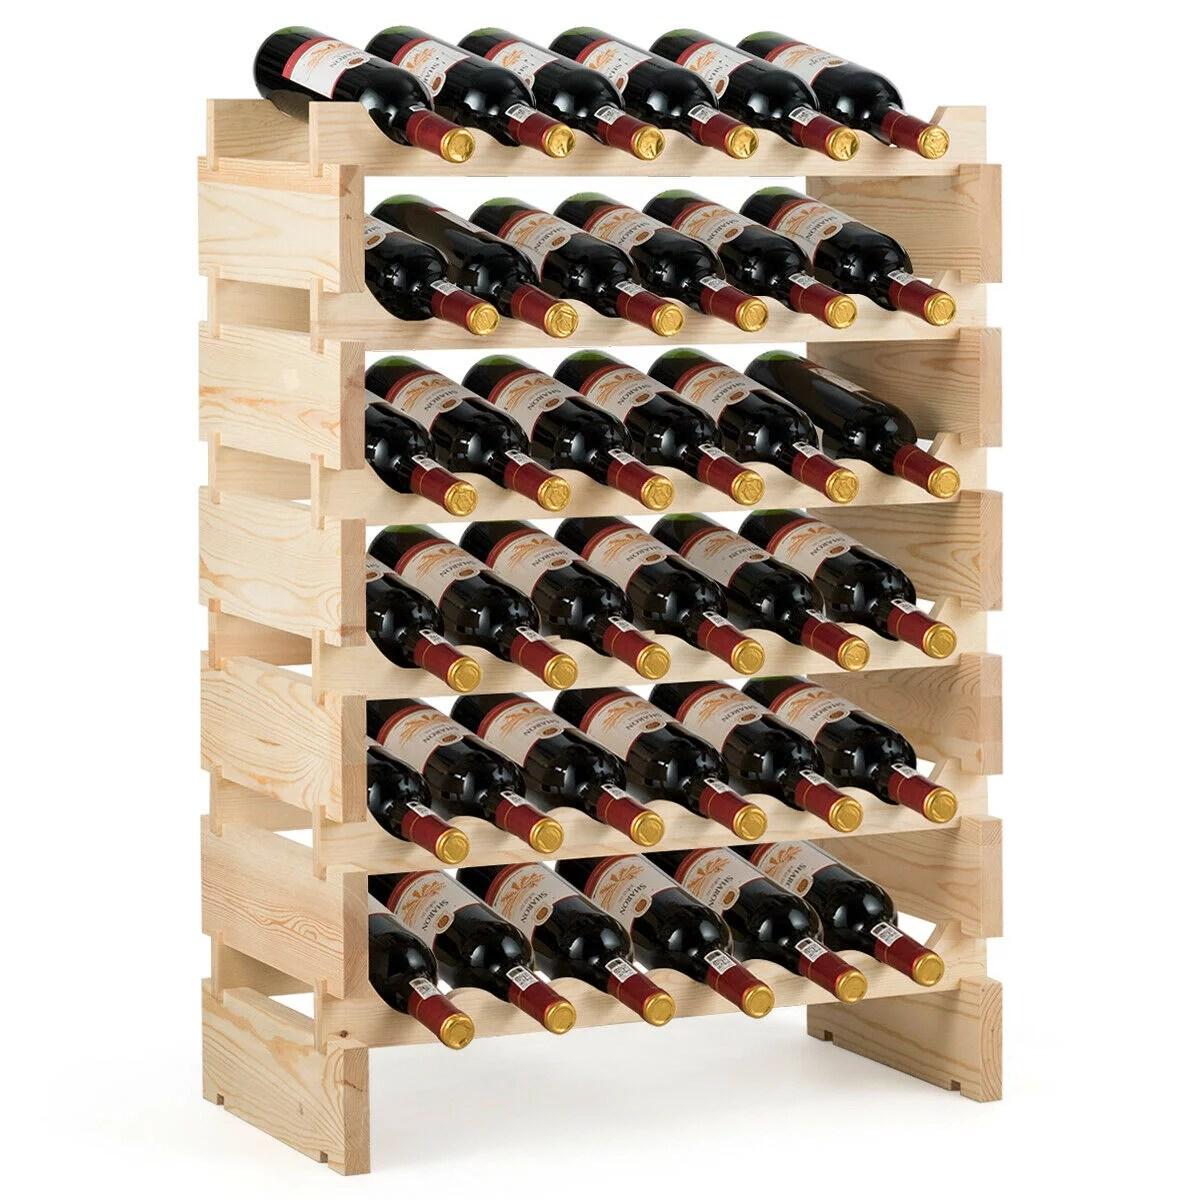 gymax 36 bottle modular wine rack 6 tier stackable wooden display shelves wobble free